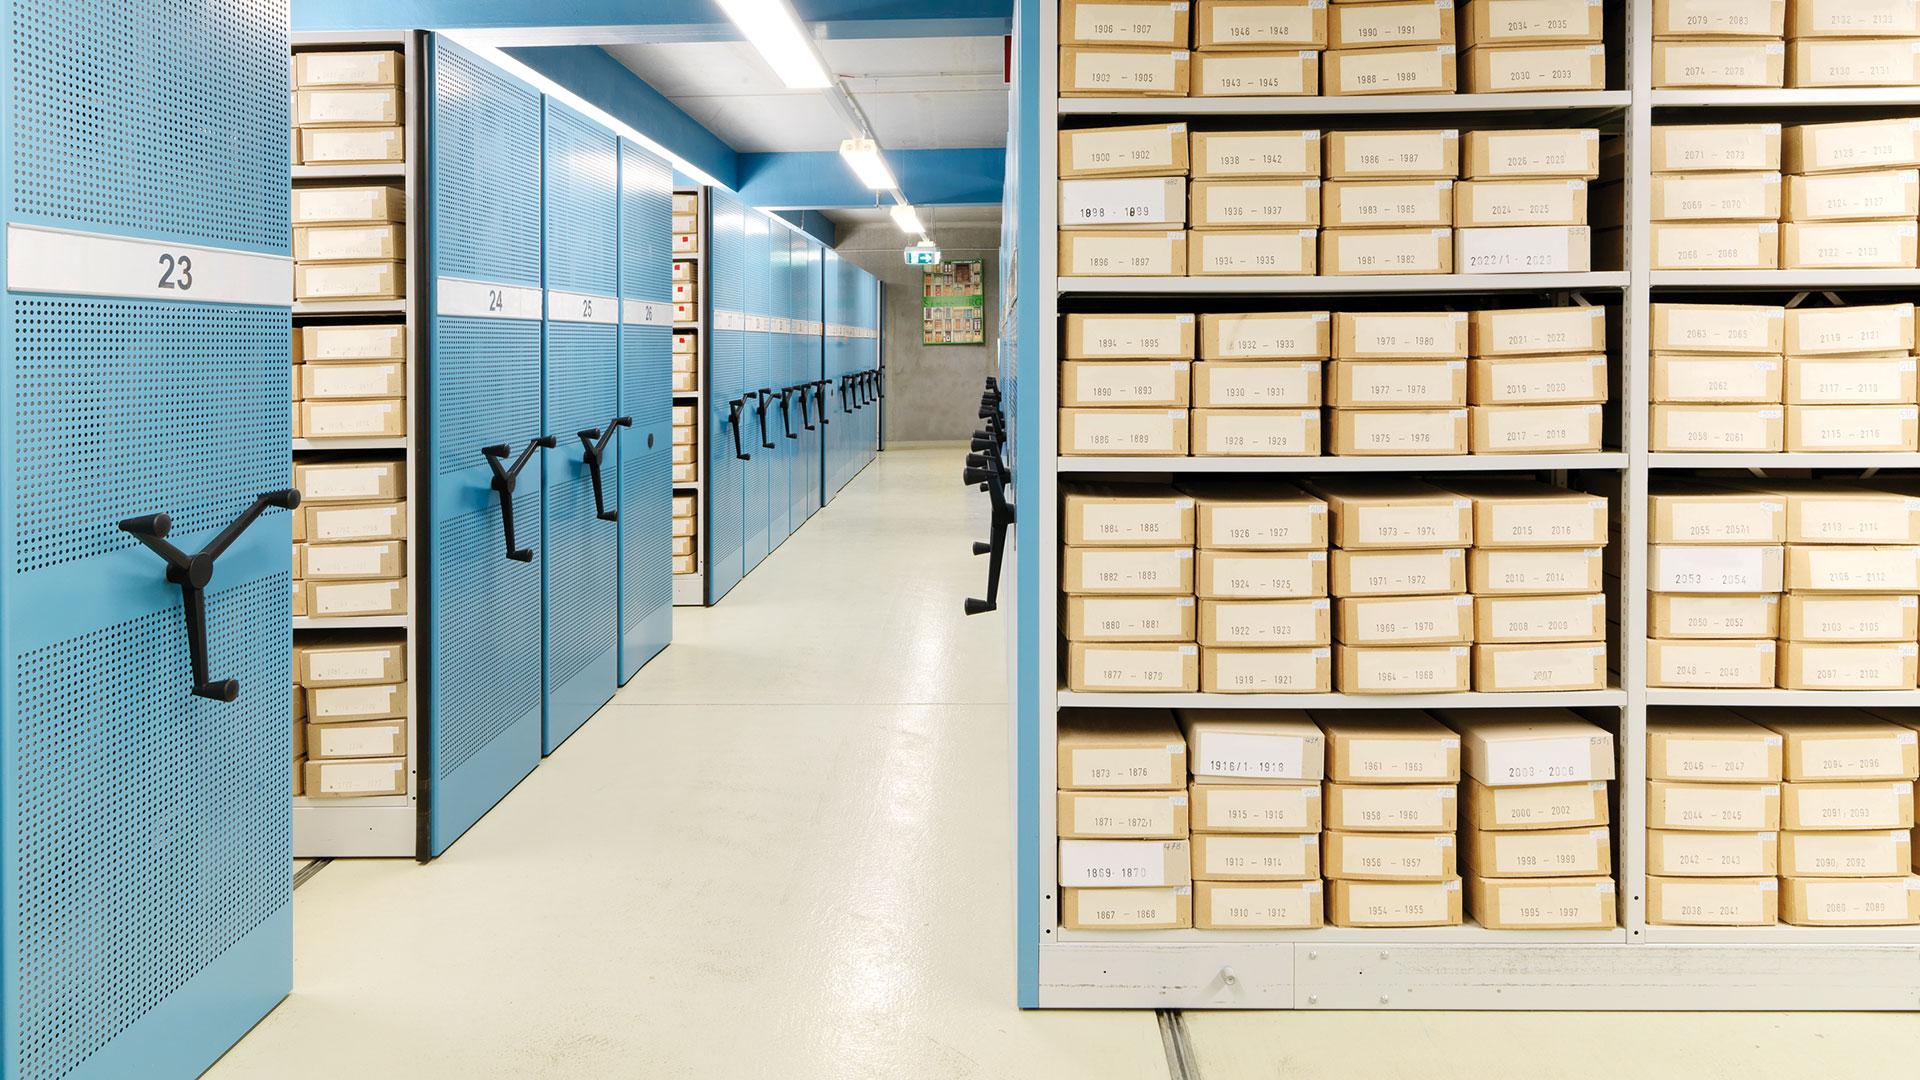 Regalsysteme-Archivregal-Rollregal_Archivkartons-RR409-mauser-16-90J9lSKexmasL8